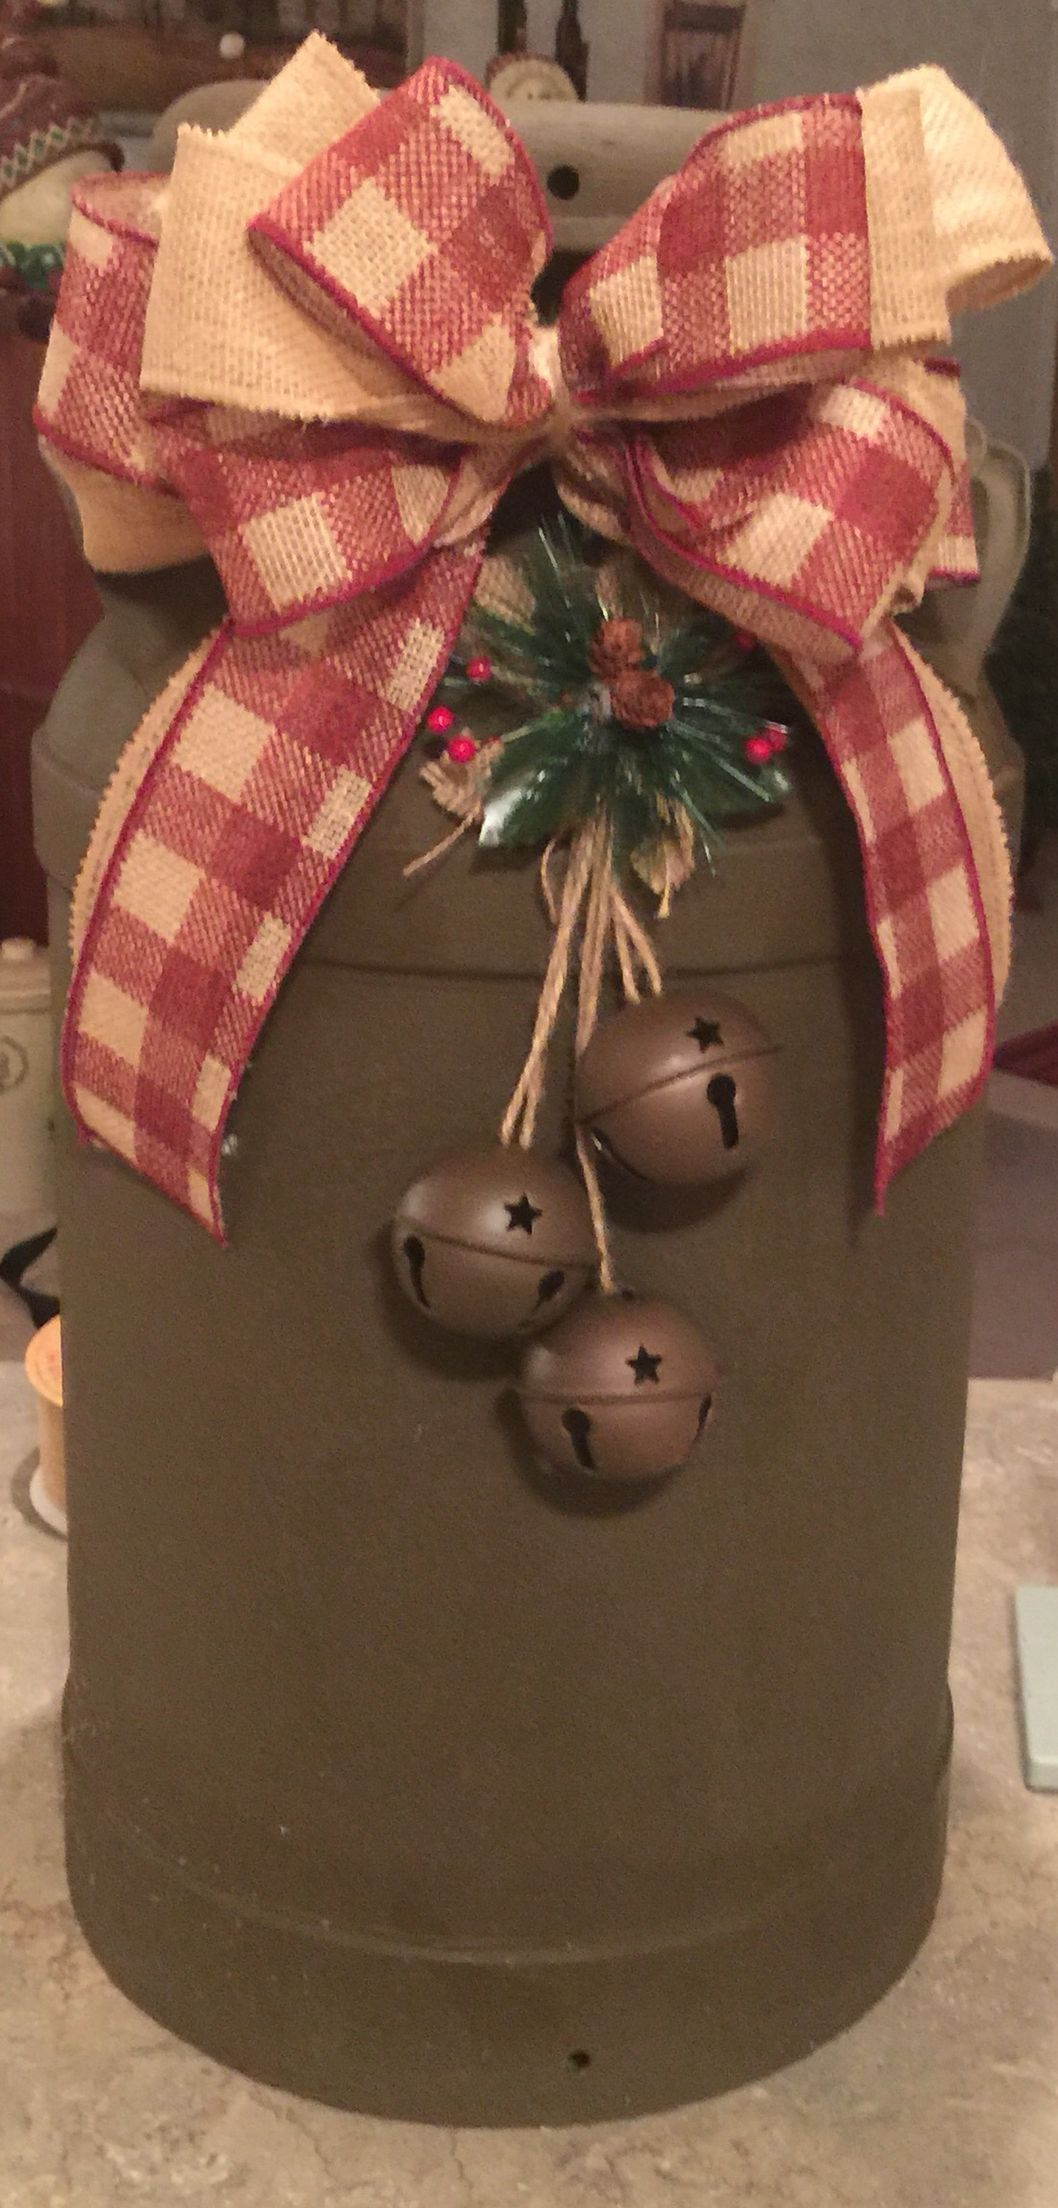 Rustic Christmas Milk Can Decor Christmas decorations